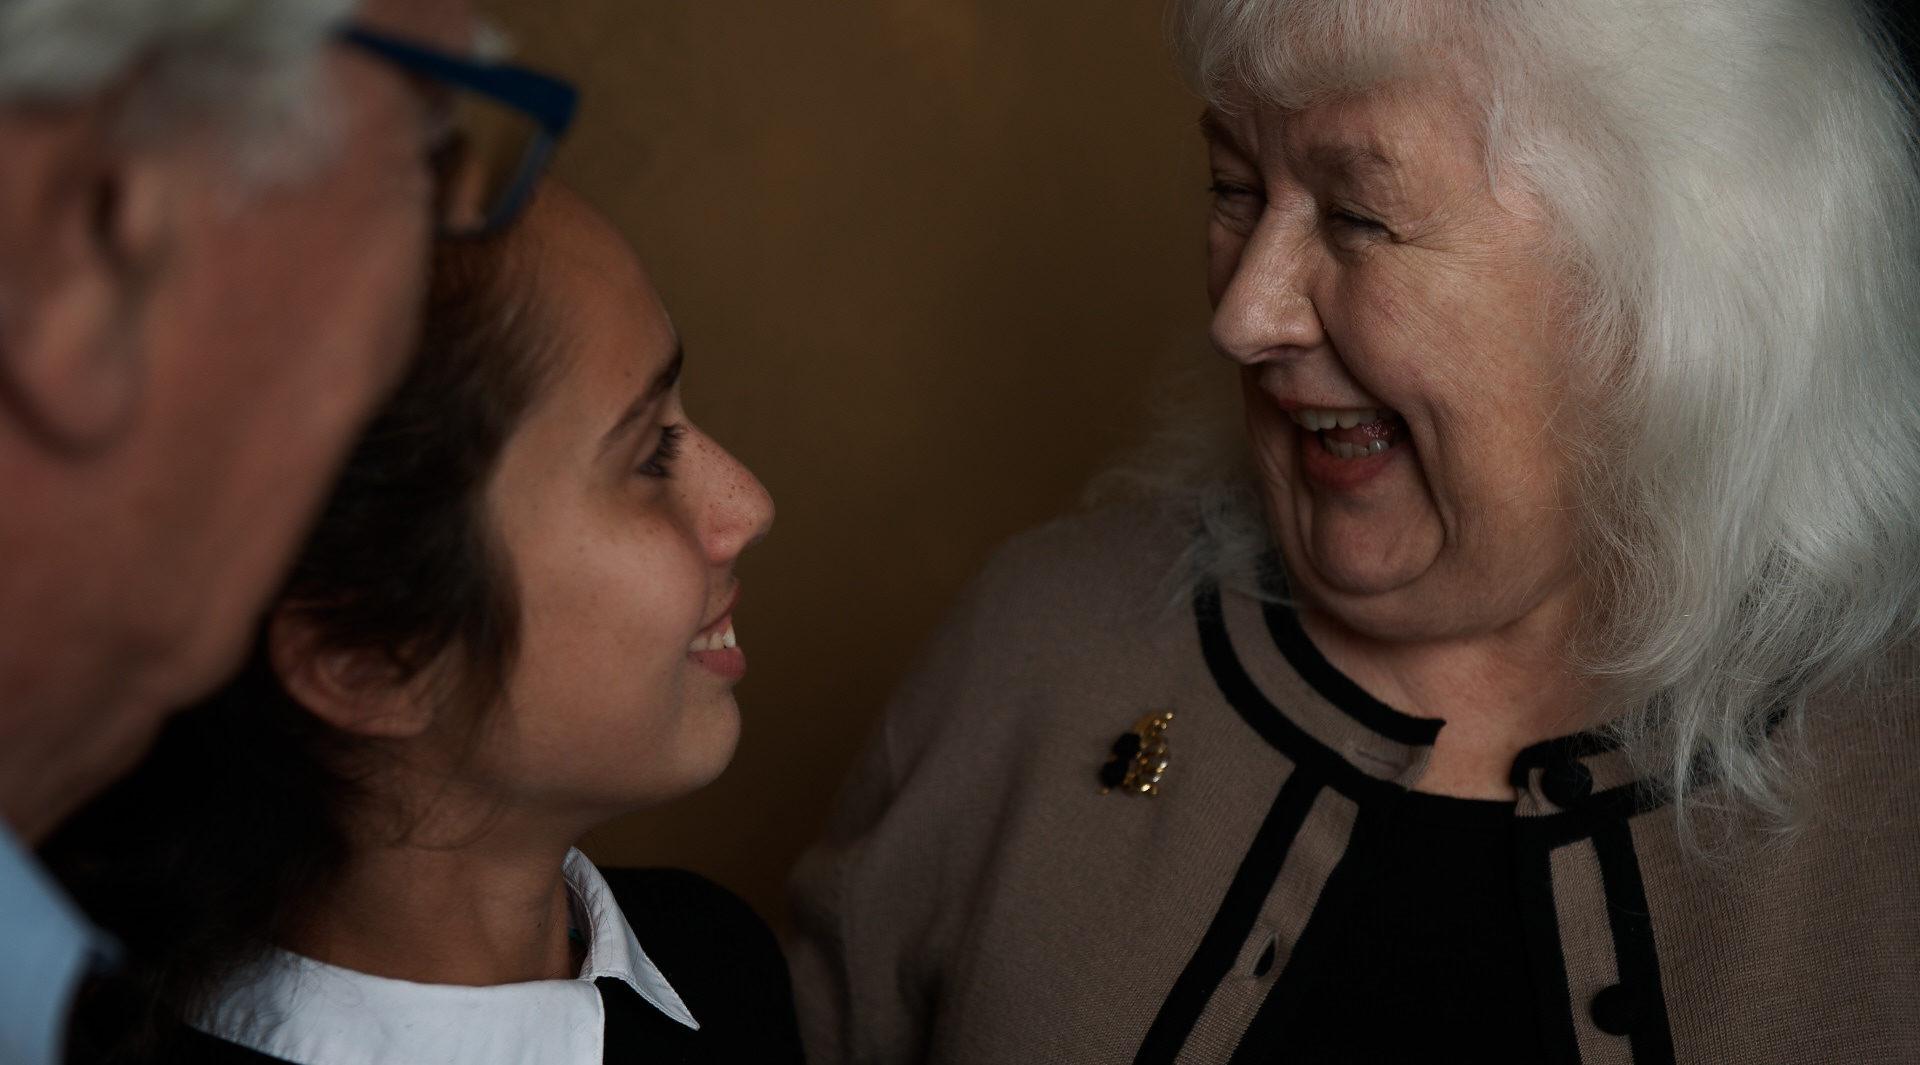 Guild Living Alliance Framework - Grandparents and grandchild smiling